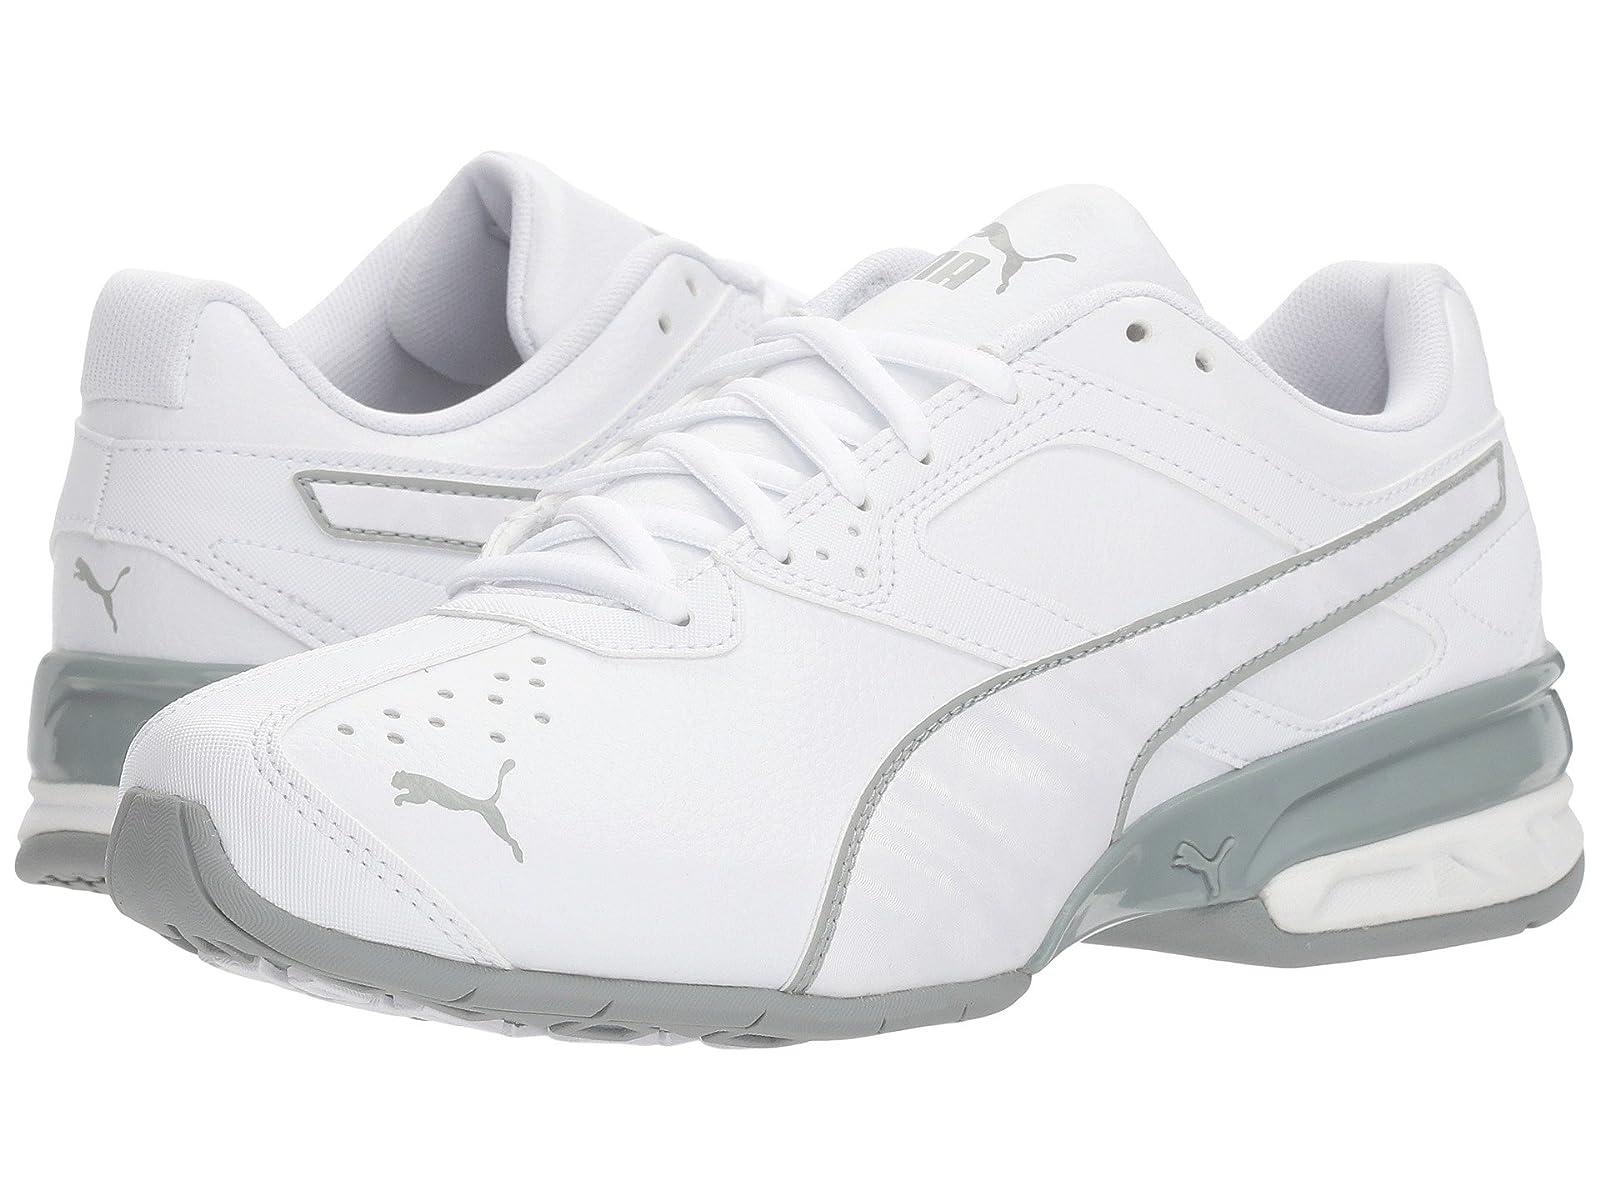 PUMA Tazon 6 IriCheap and distinctive eye-catching shoes